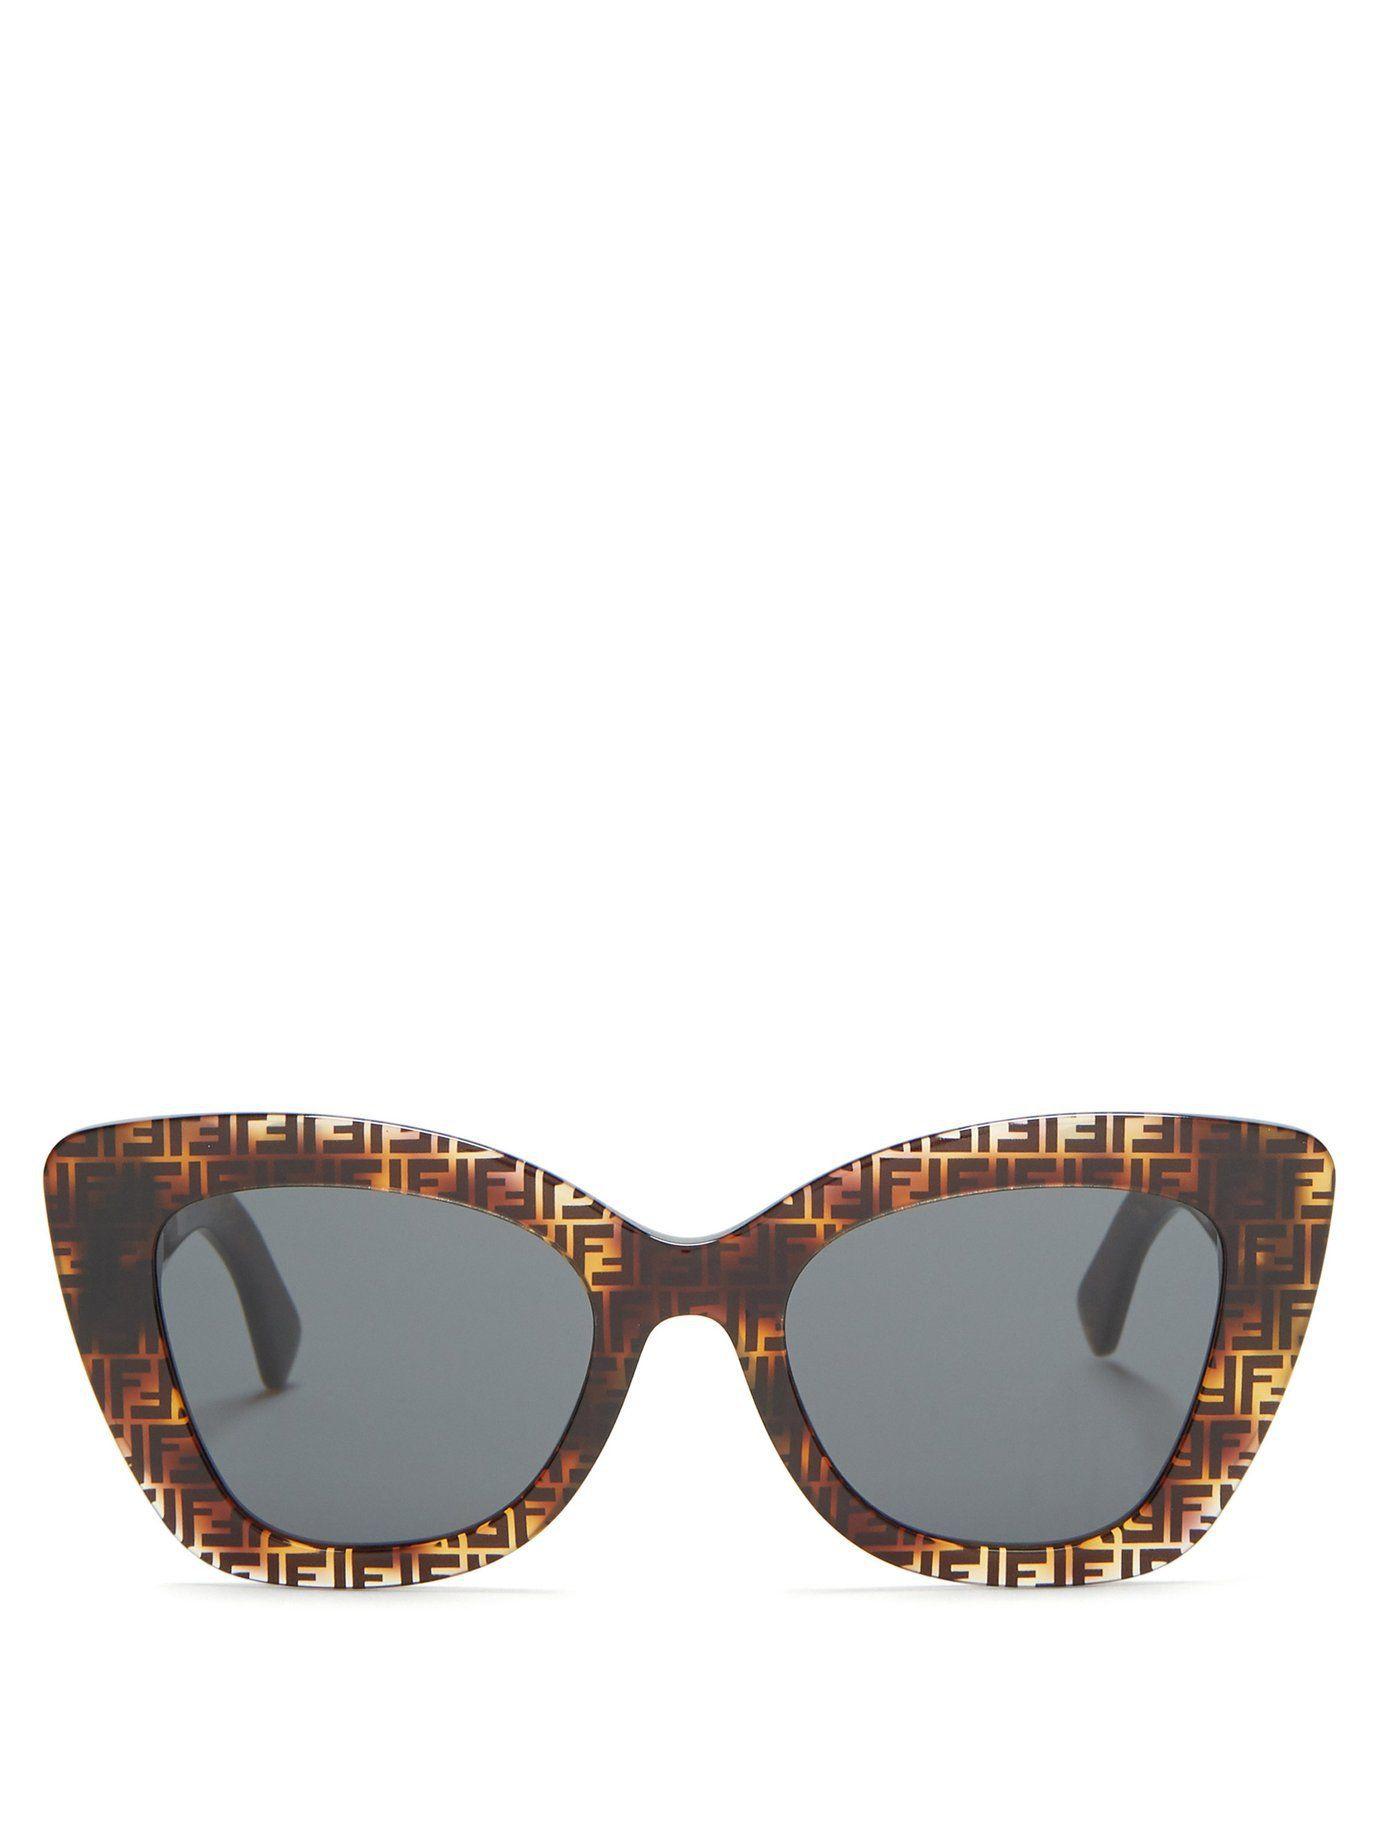 2469d5a4393e FENDI logo sunglasses FF x acetate cat-eye #outfits #style  #styleinspiration #